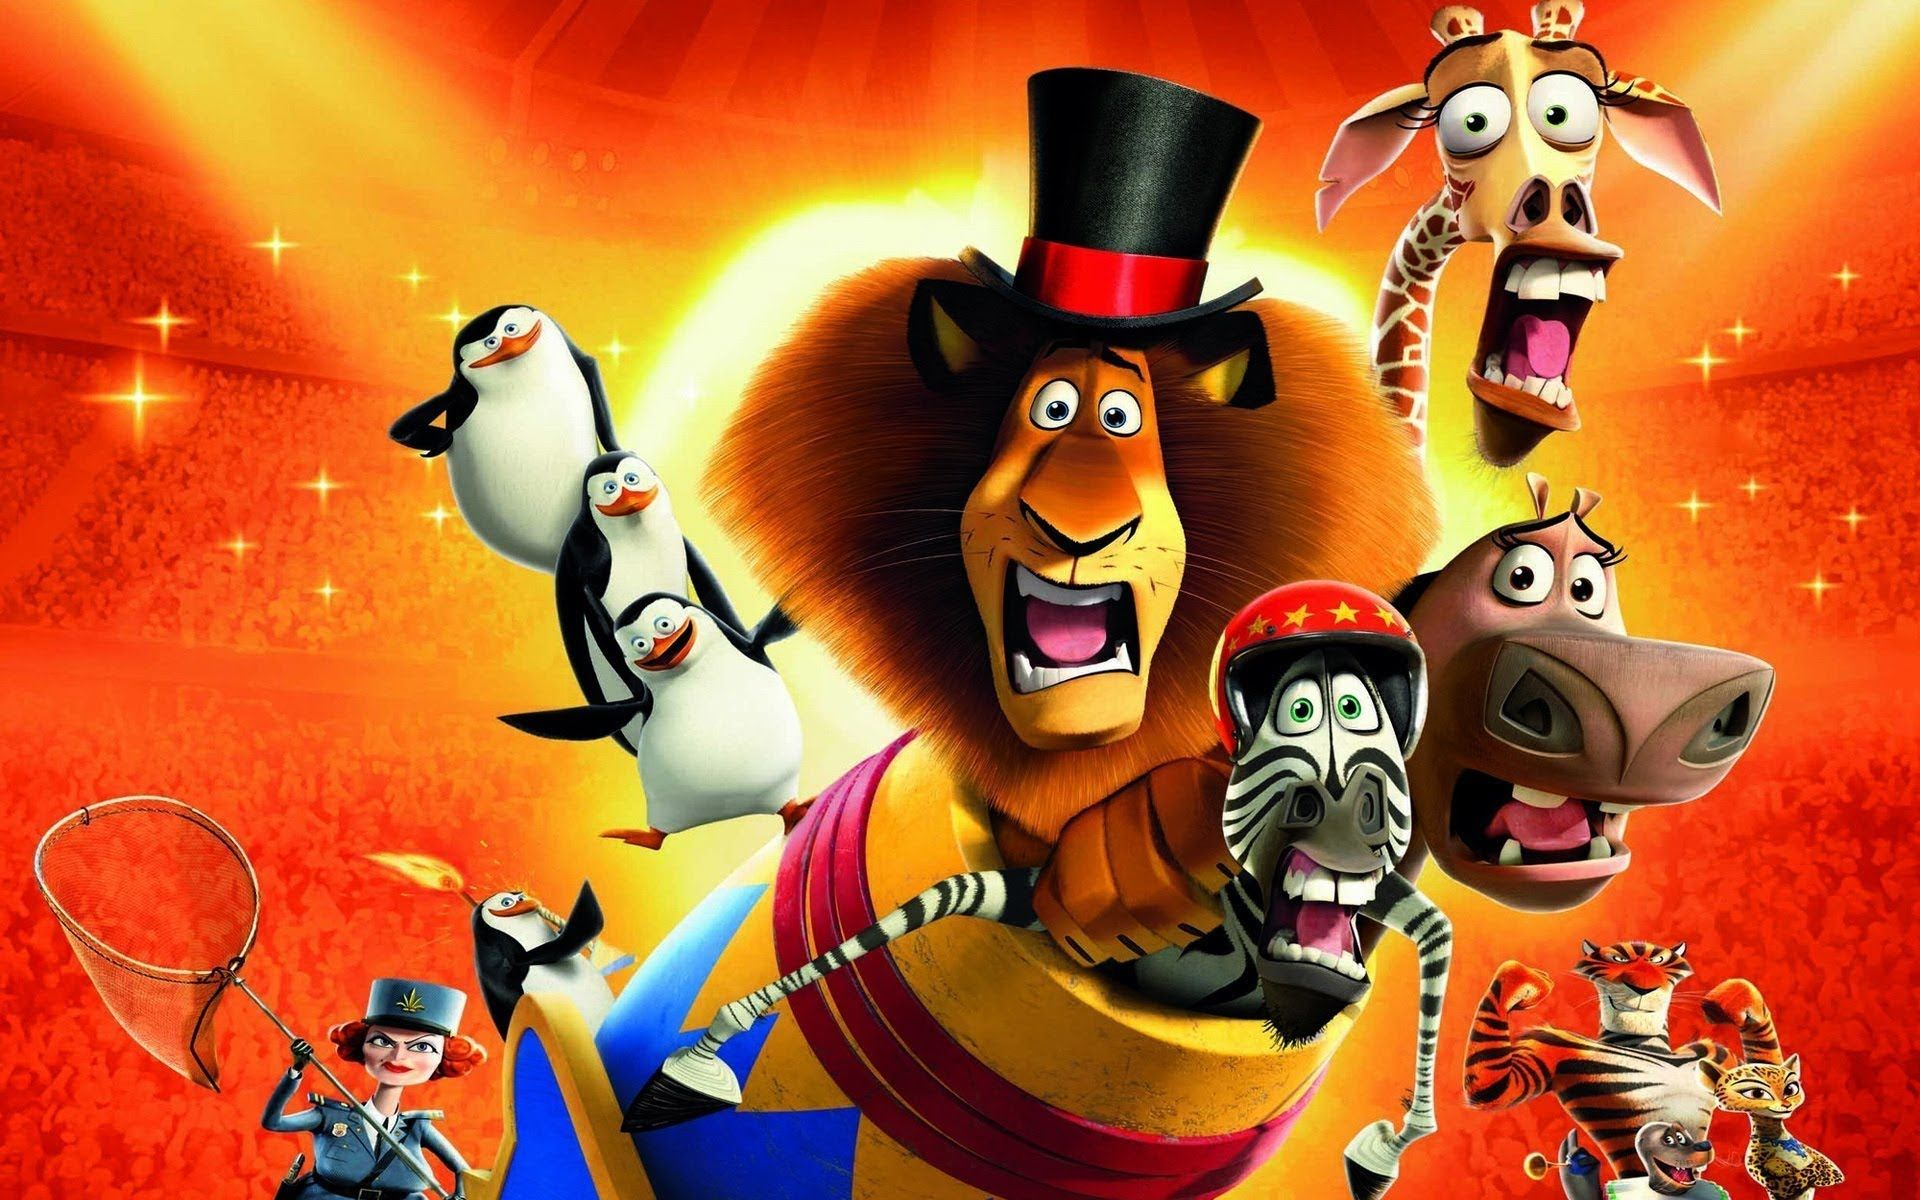 Madagascar 3 Pelicula Completa En Espanol Latino Chidoo Kid Movies Animated Movies Animated Cartoon Movies